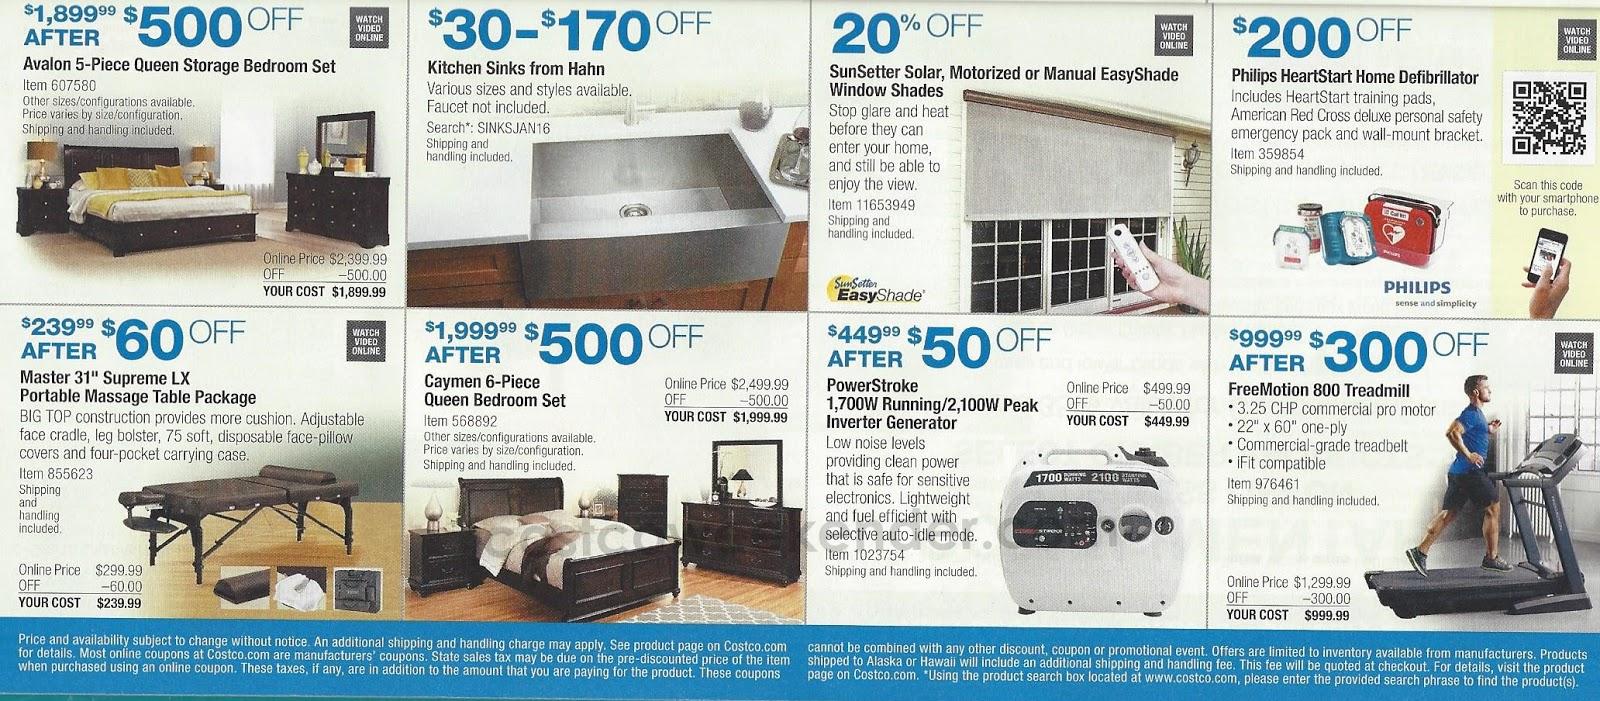 Costco photo discount coupons